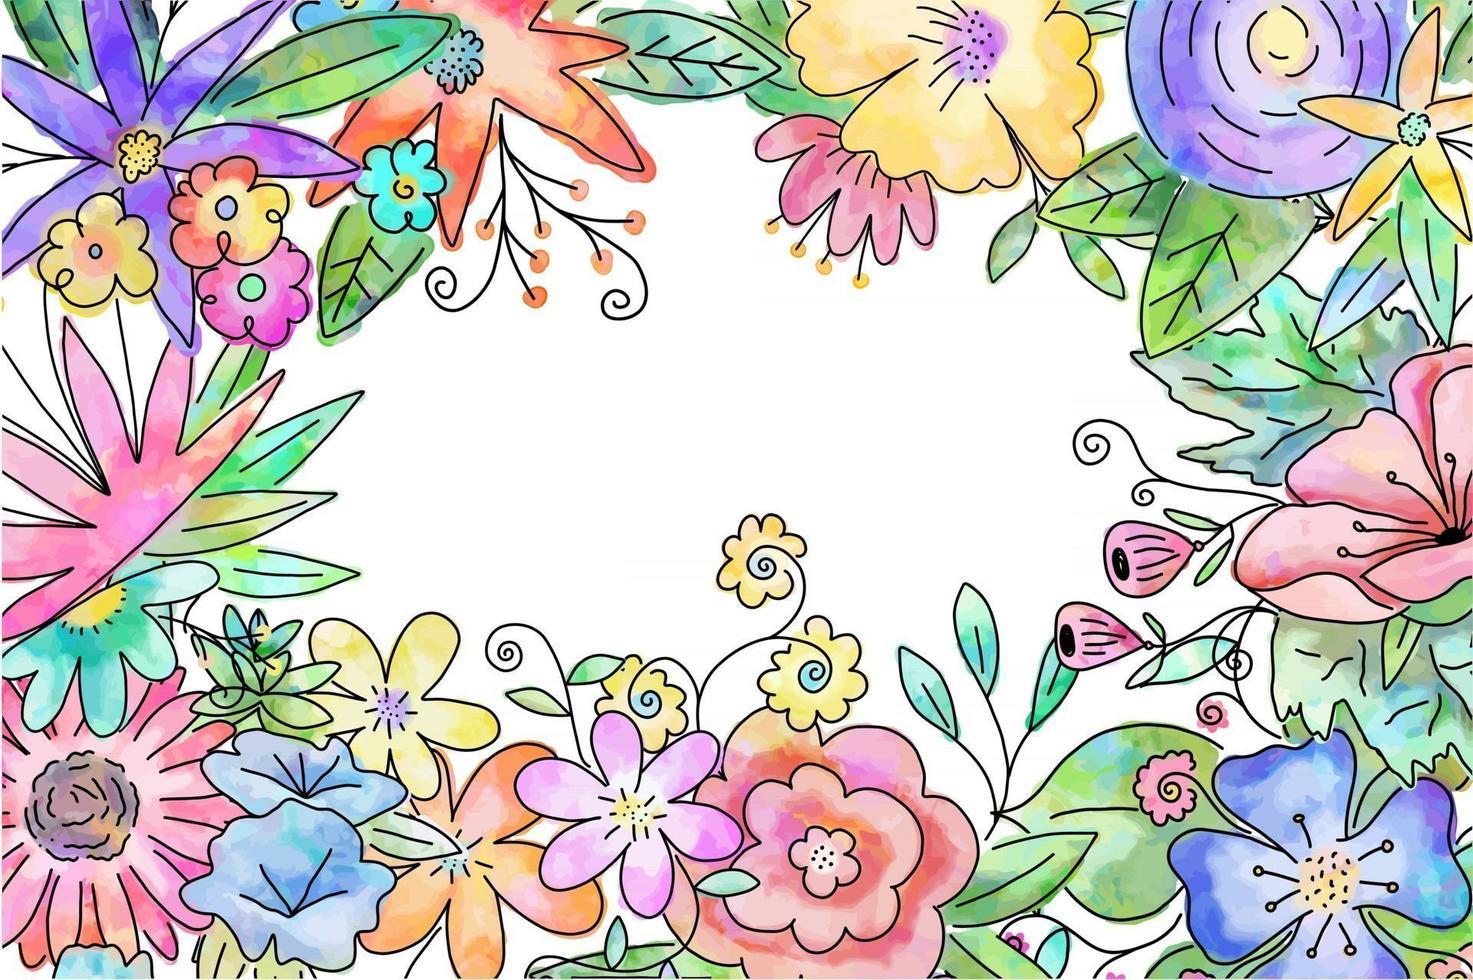 quadro floral aquarela bonito decorativo vetor